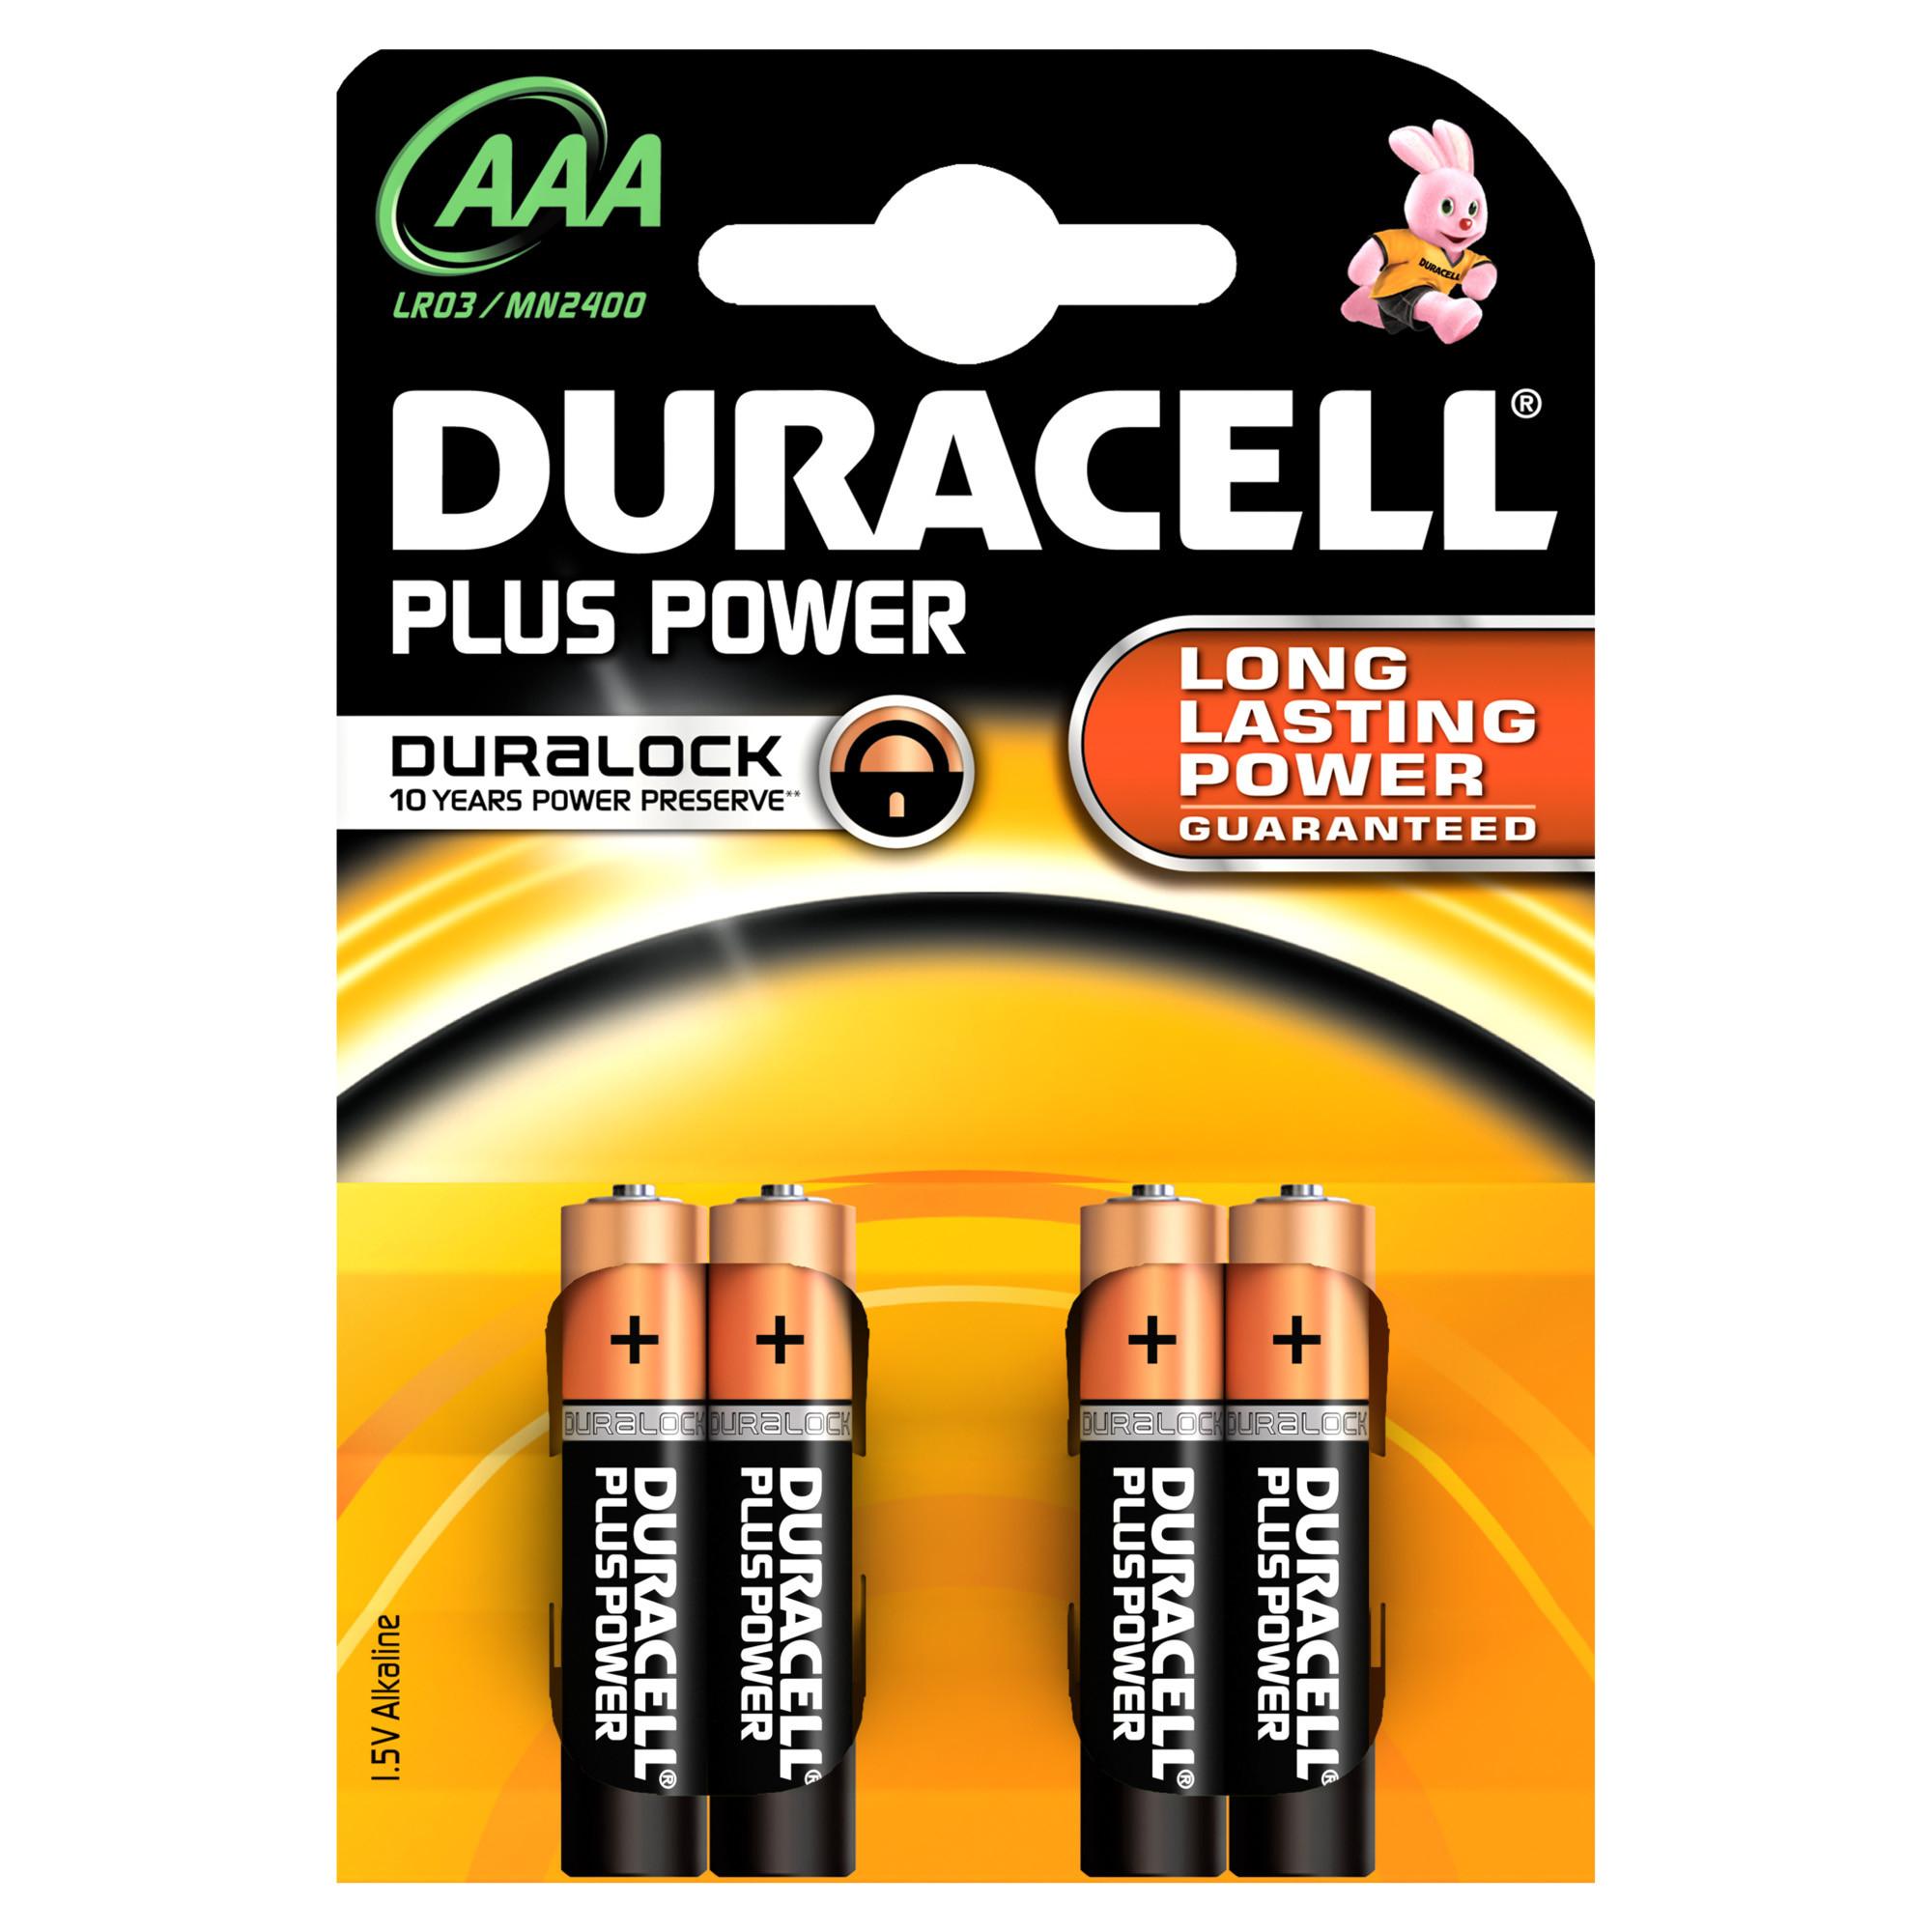 Duracell Plus Power AAA - 4 batterie LR03 MN2400